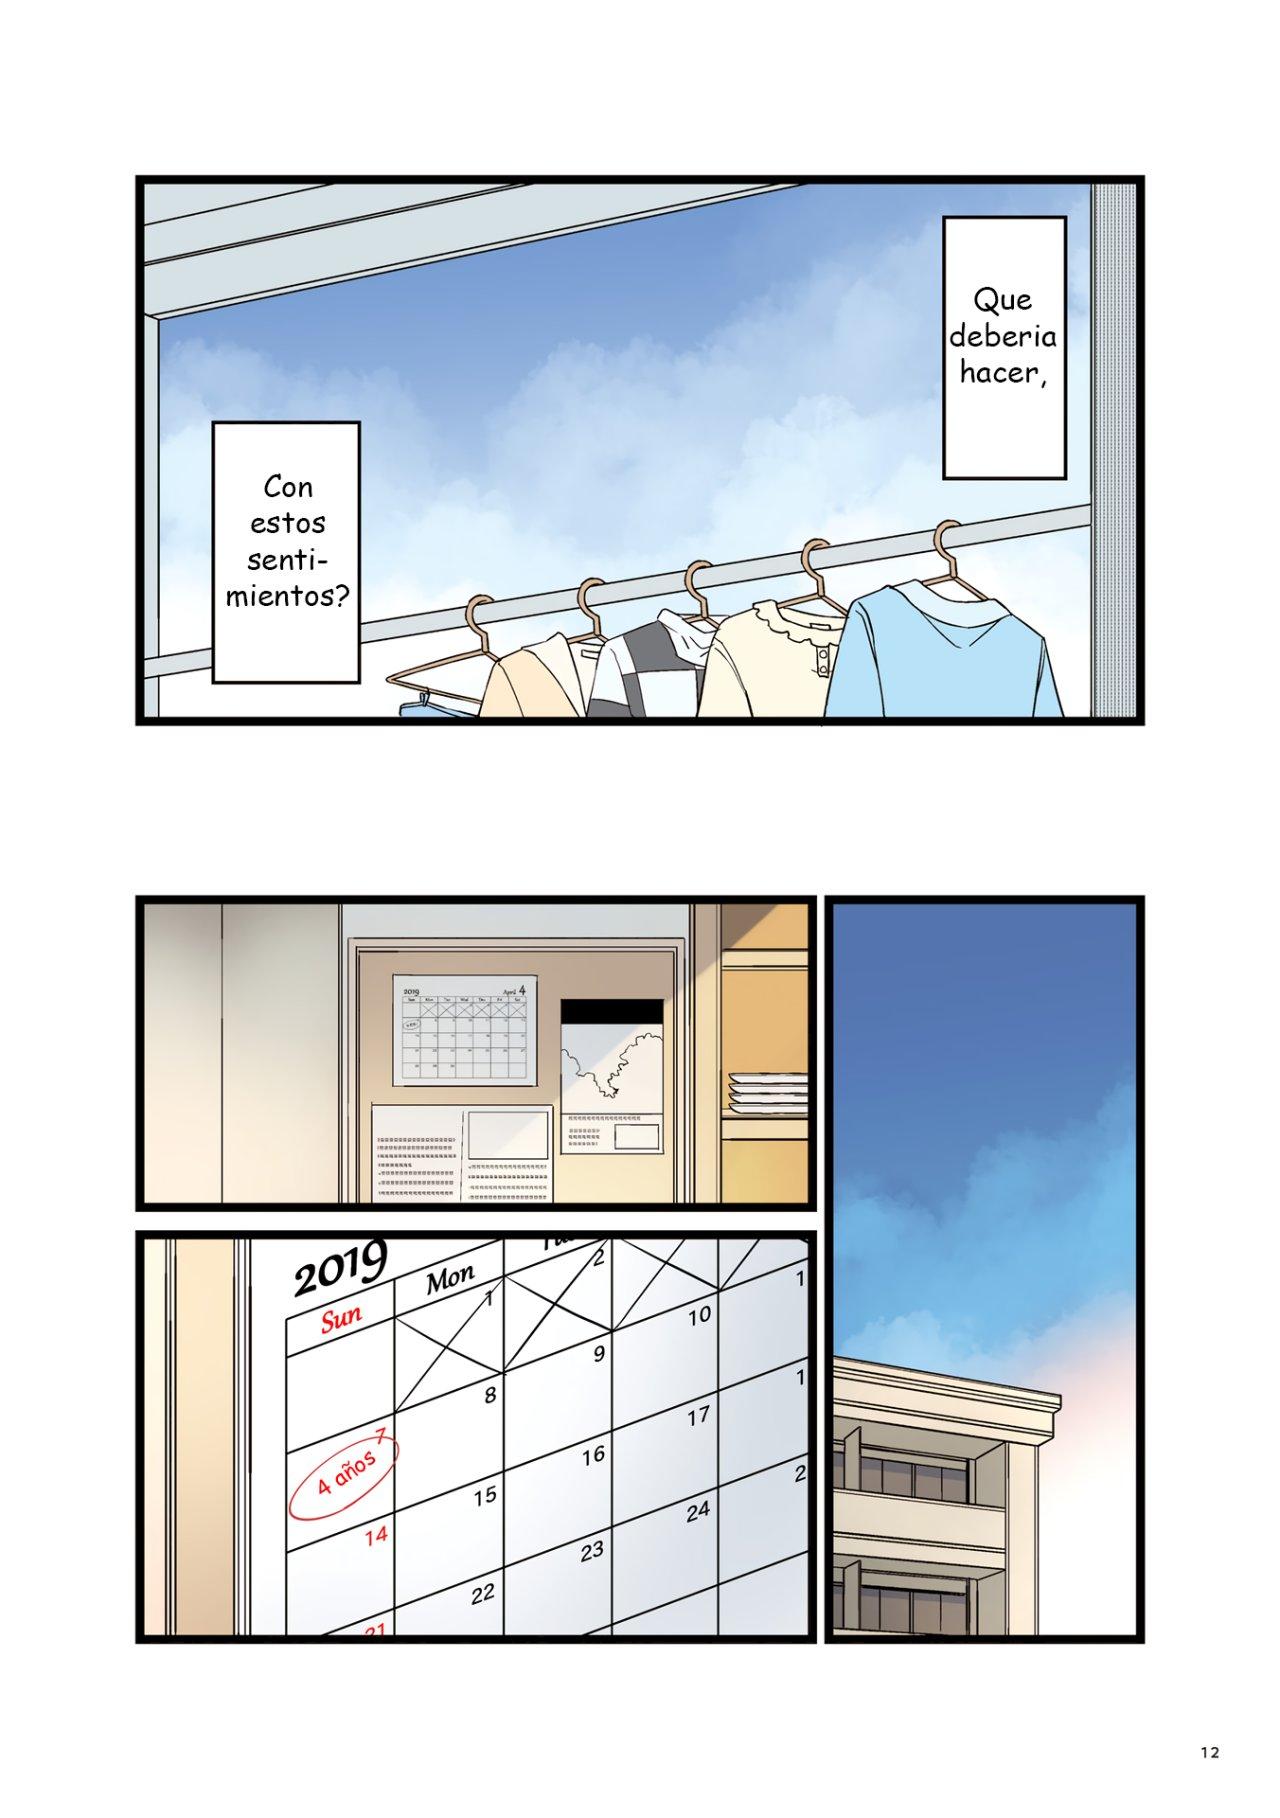 https://nine.mangadogs.com/es_manga/pic8/60/36668/946546/db92620d3ccfb474aec36f8ce82be1a5.jpg Page 9